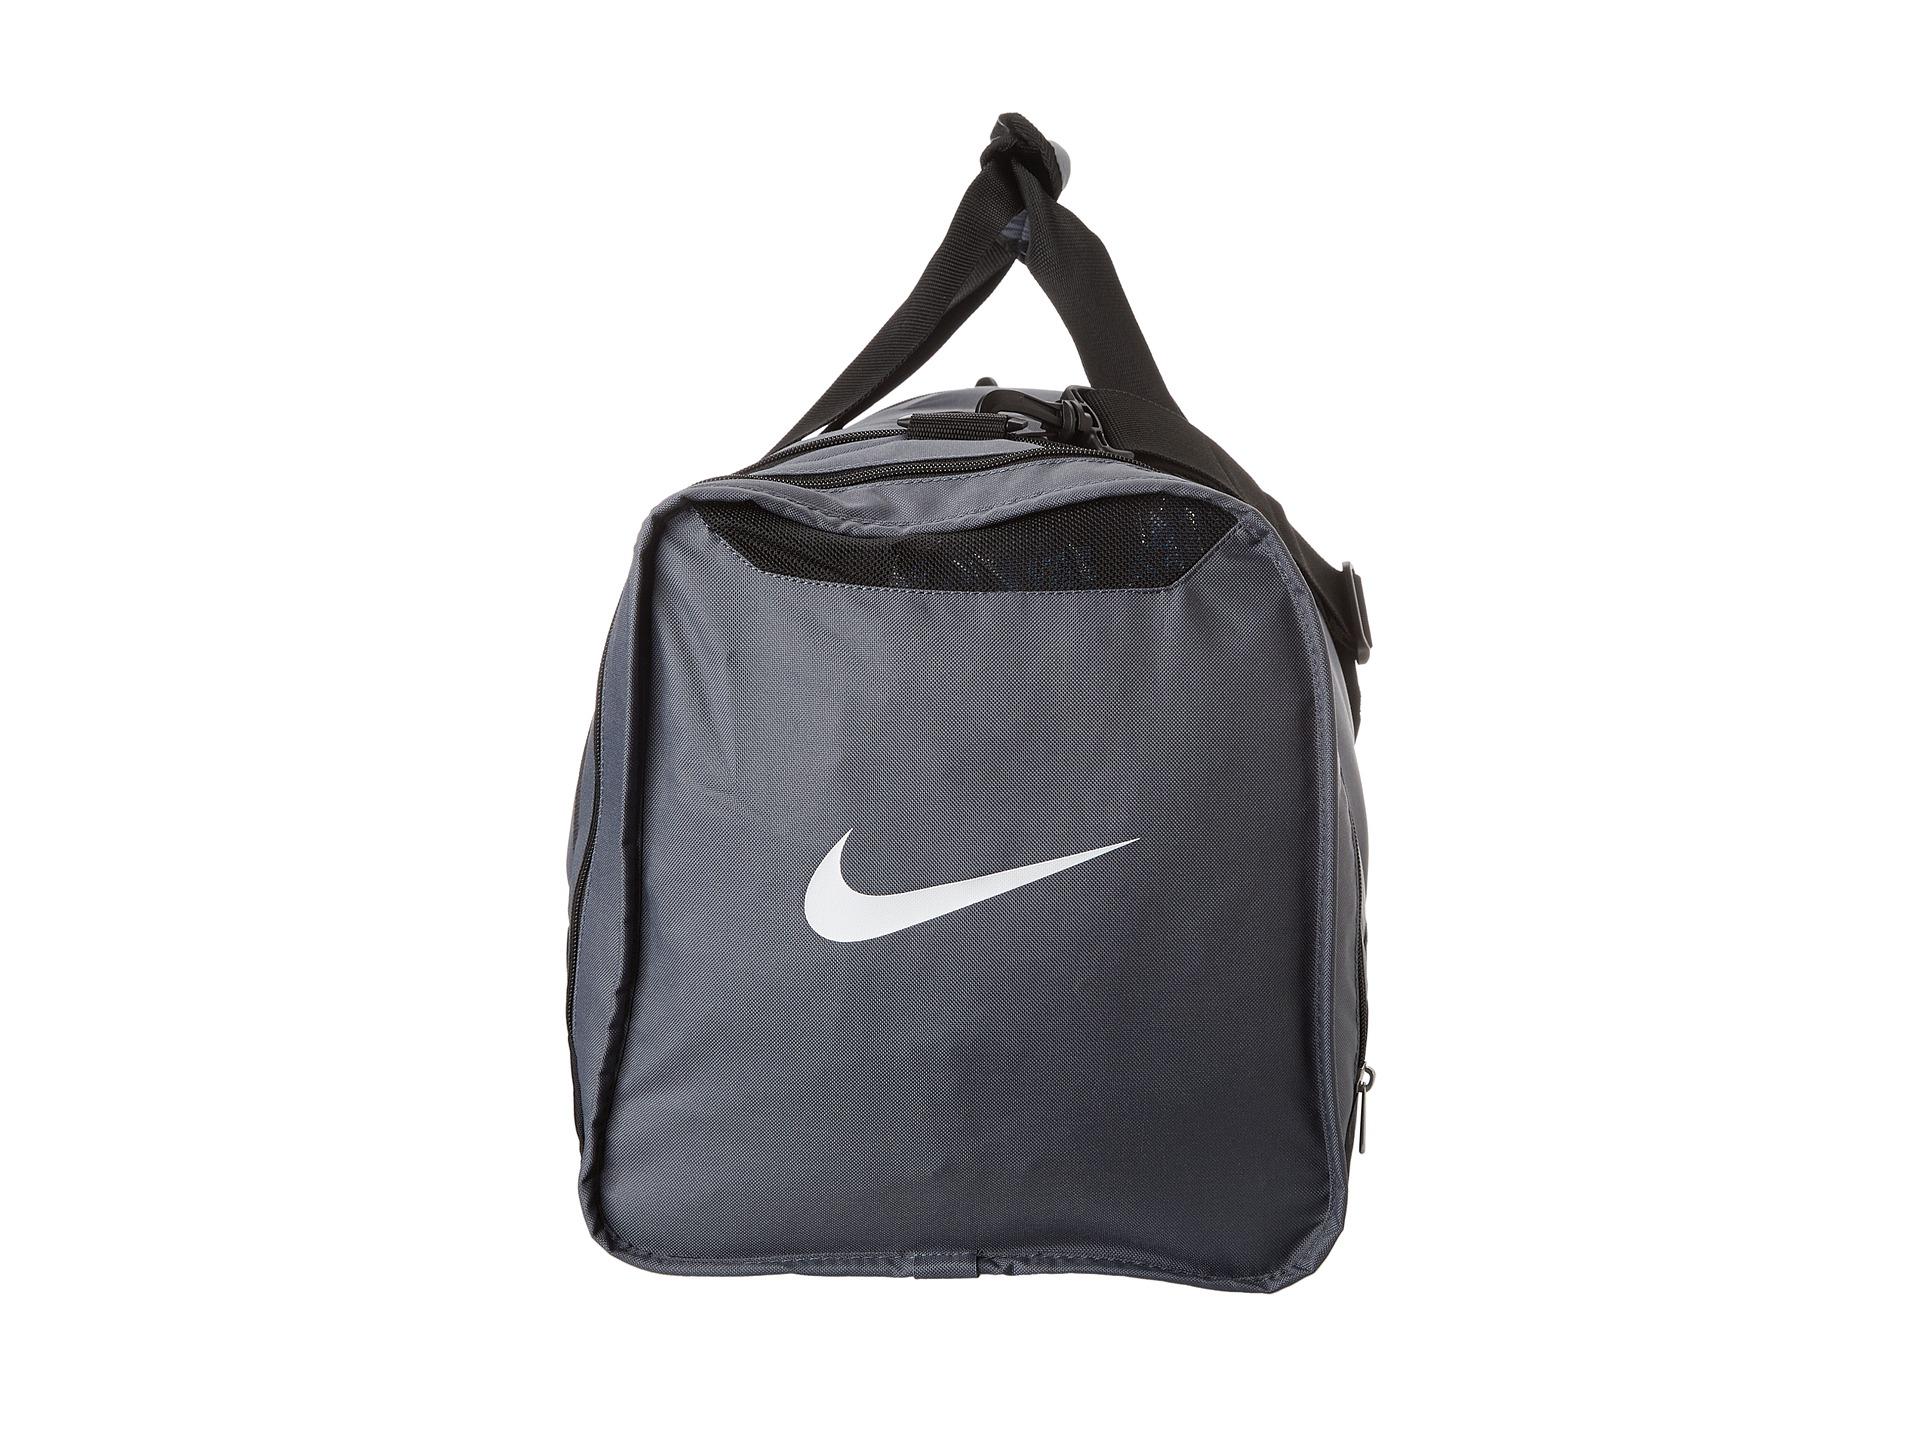 cac54df3c4 Lyst - Nike Brasilia 6 Medium Duffel in Gray